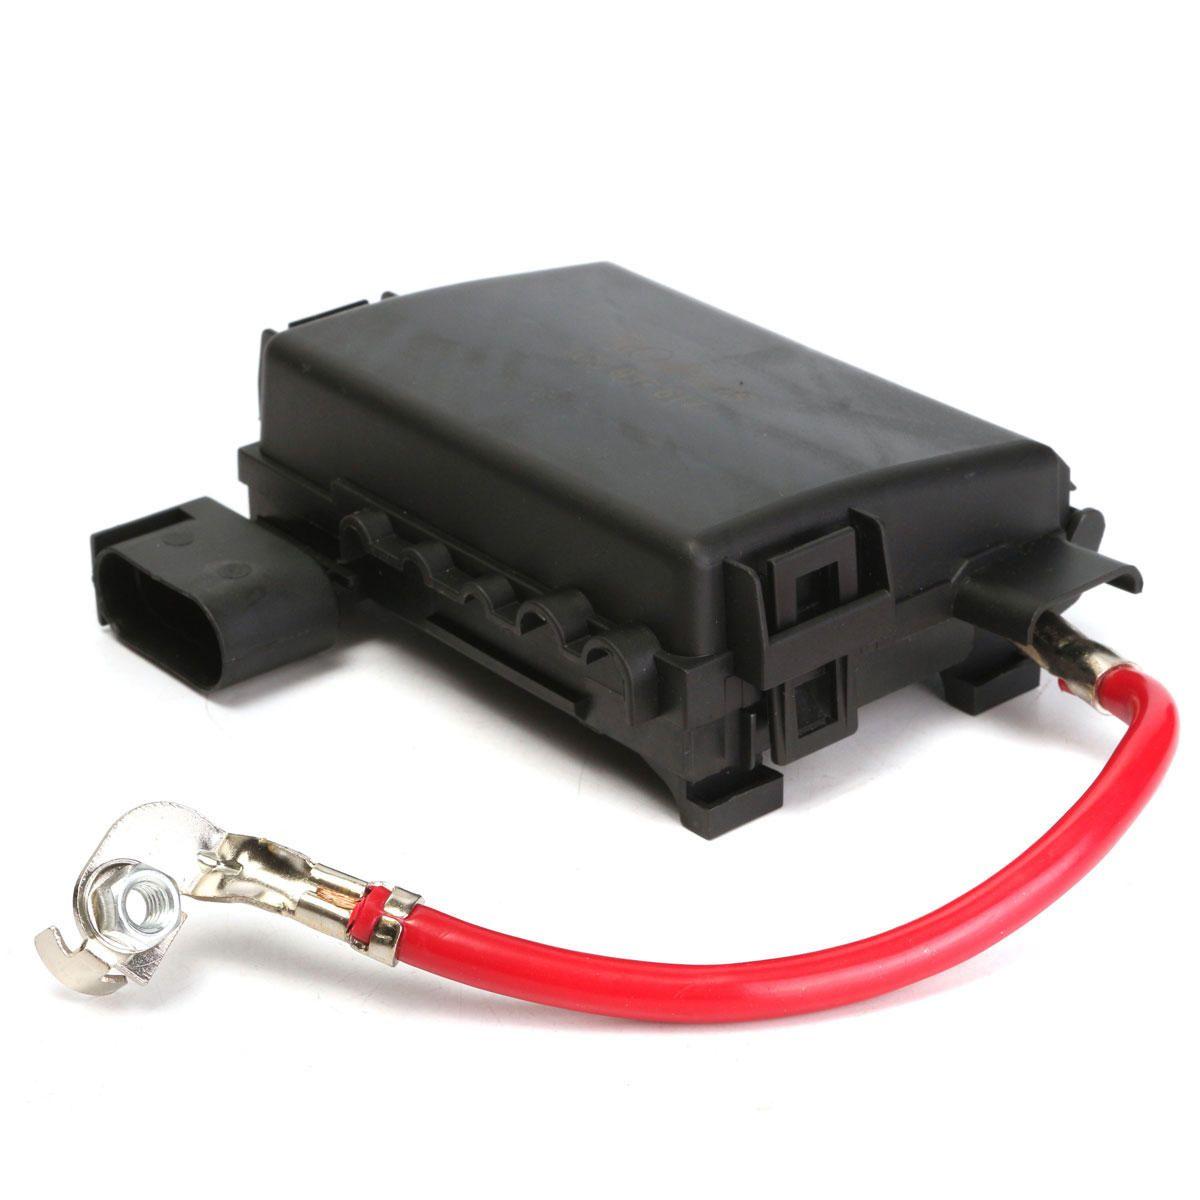 medium resolution of automotive fuse box insurance tablets for golf vw jetta mk4 1999 2004 1j0937550a 1999 automotive golf 1j0937550a fuse for tablets jetta mk4 2004